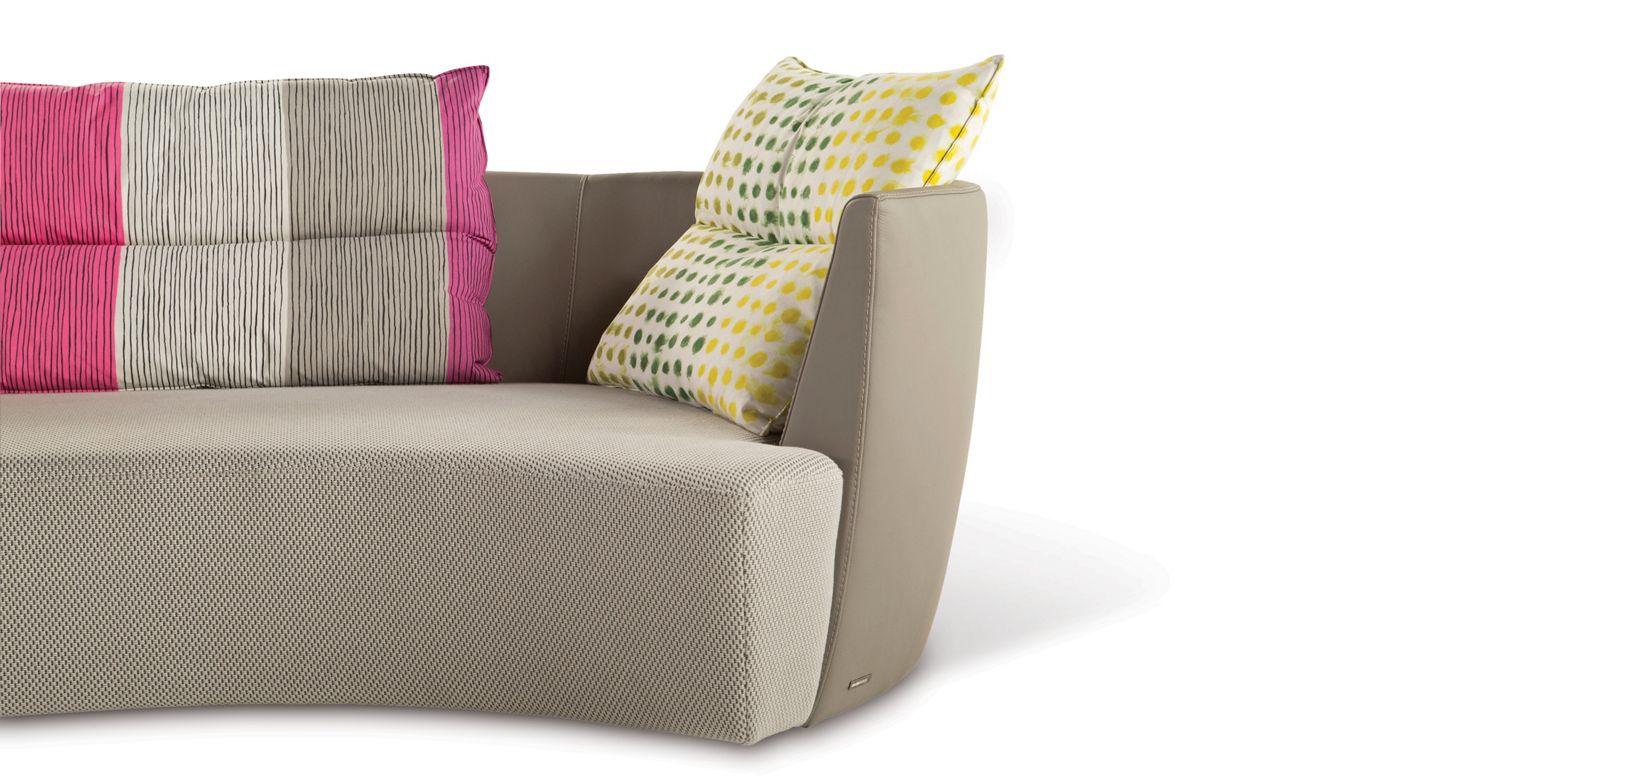 canape 4 places arrondi reportage roche bobois. Black Bedroom Furniture Sets. Home Design Ideas